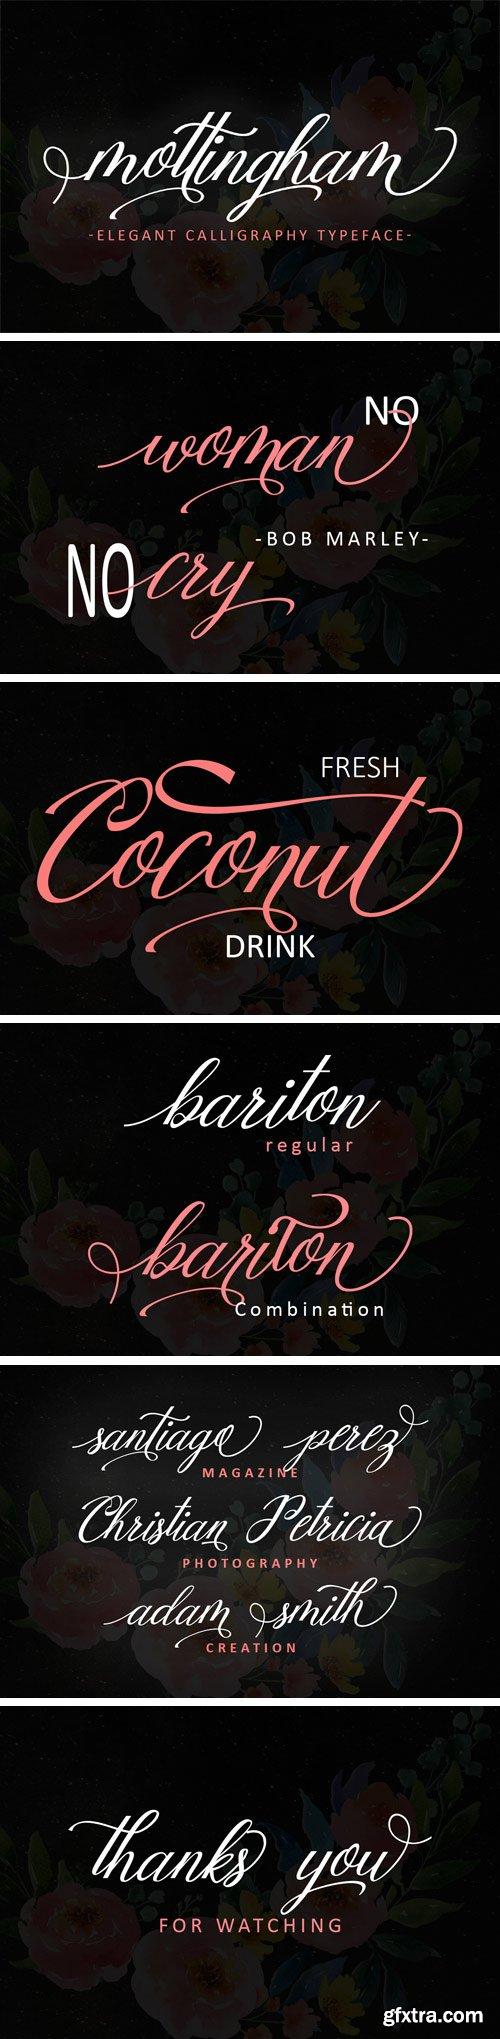 Fontbundles - Mottingham Elegant Calligraphy Typeface 176778